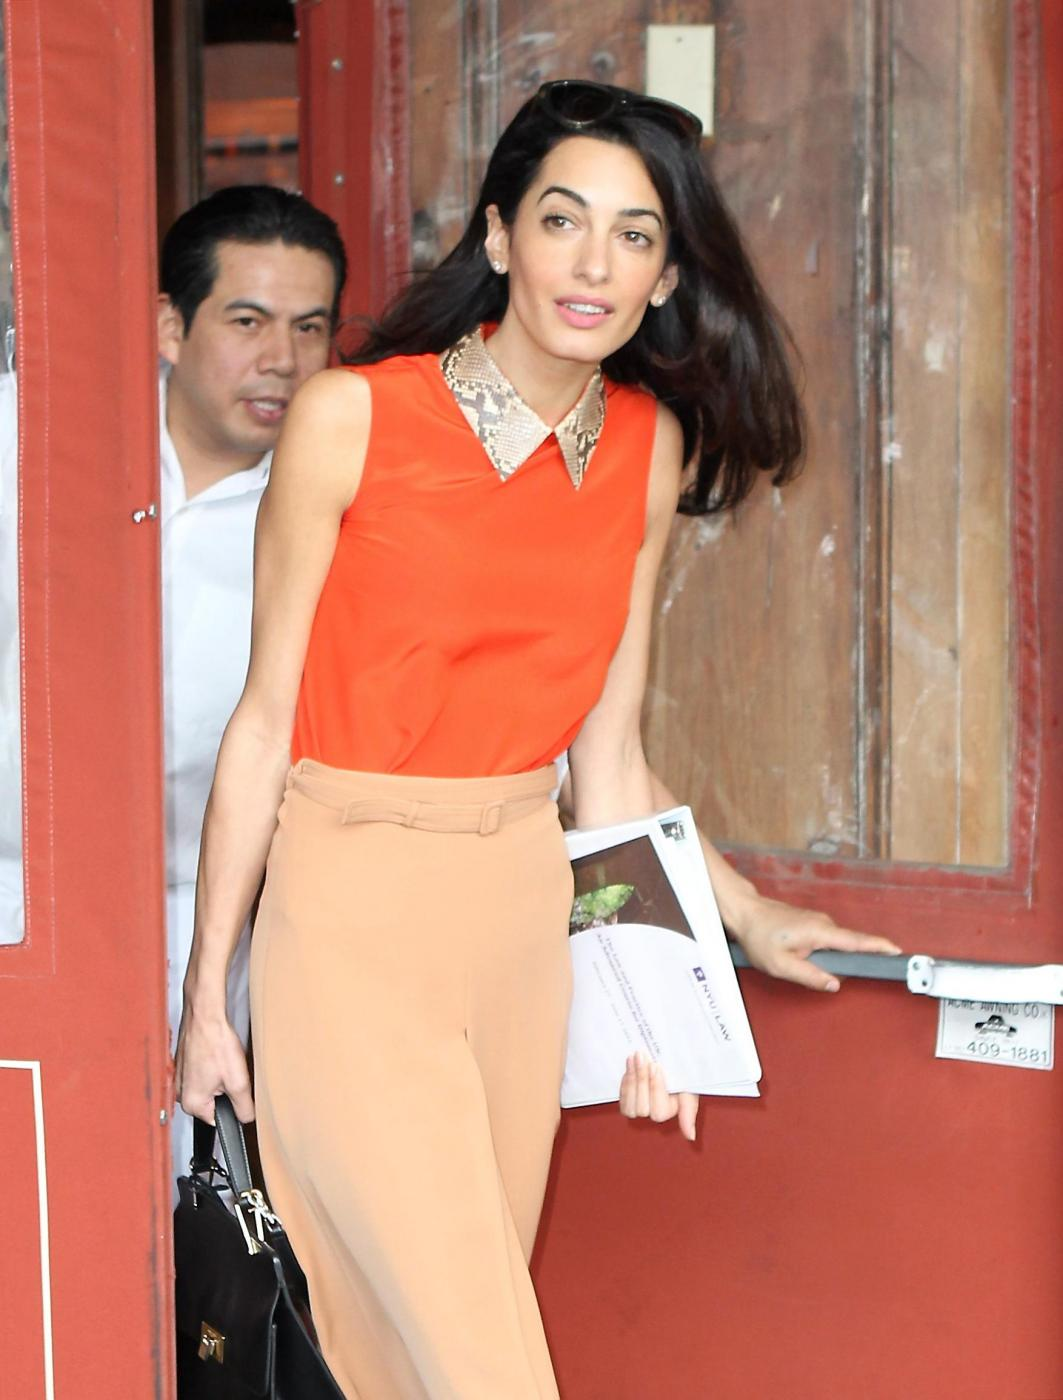 Amal Alamuddin magrissima, lady Clooney quasi scheletrica FOTO